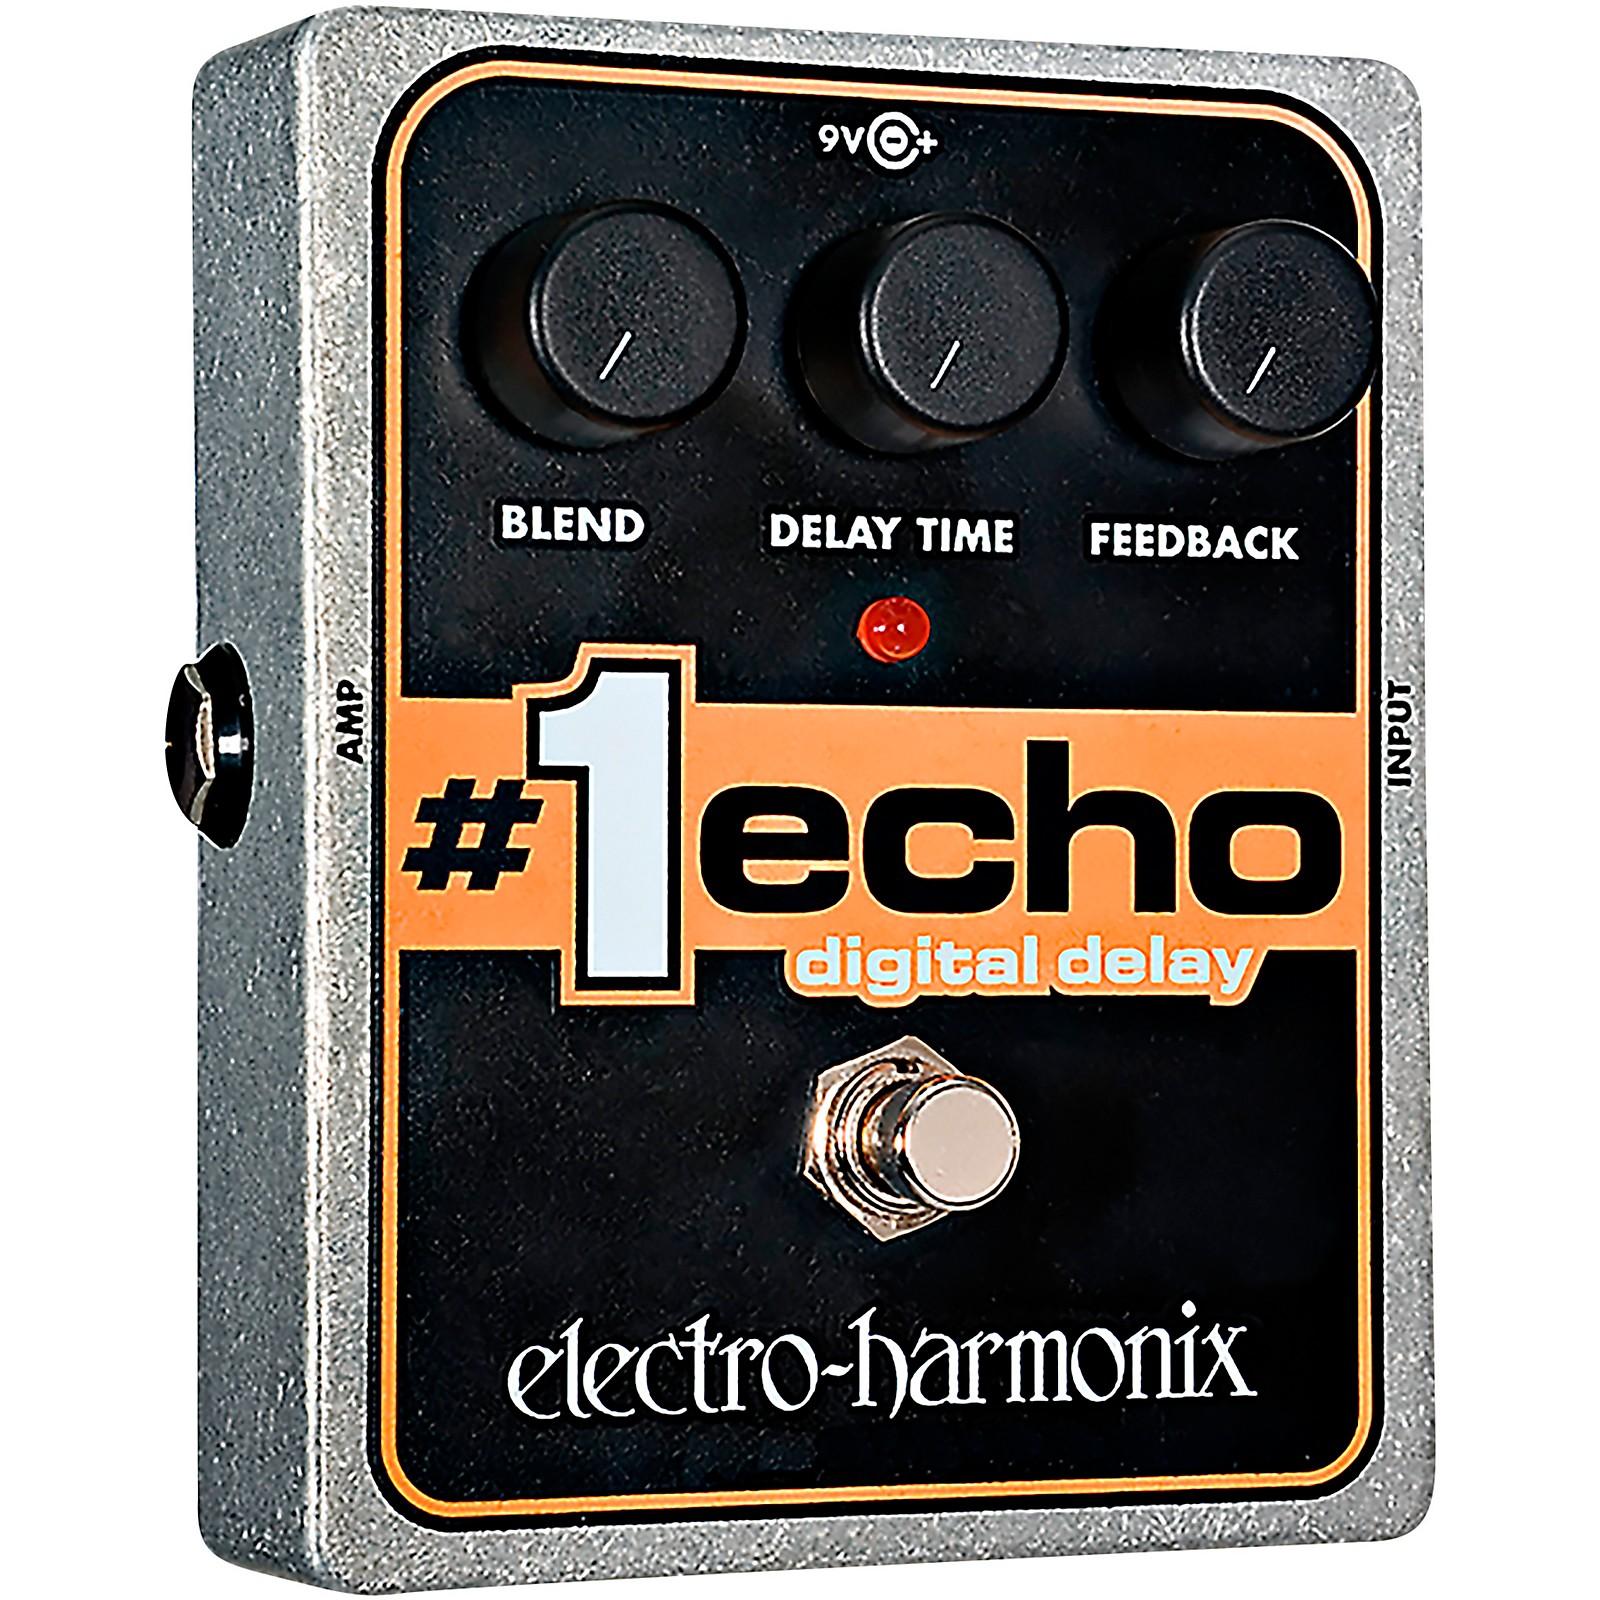 Electro-Harmonix XO #1 Echo Digital Delay Guitar Effects Pedal